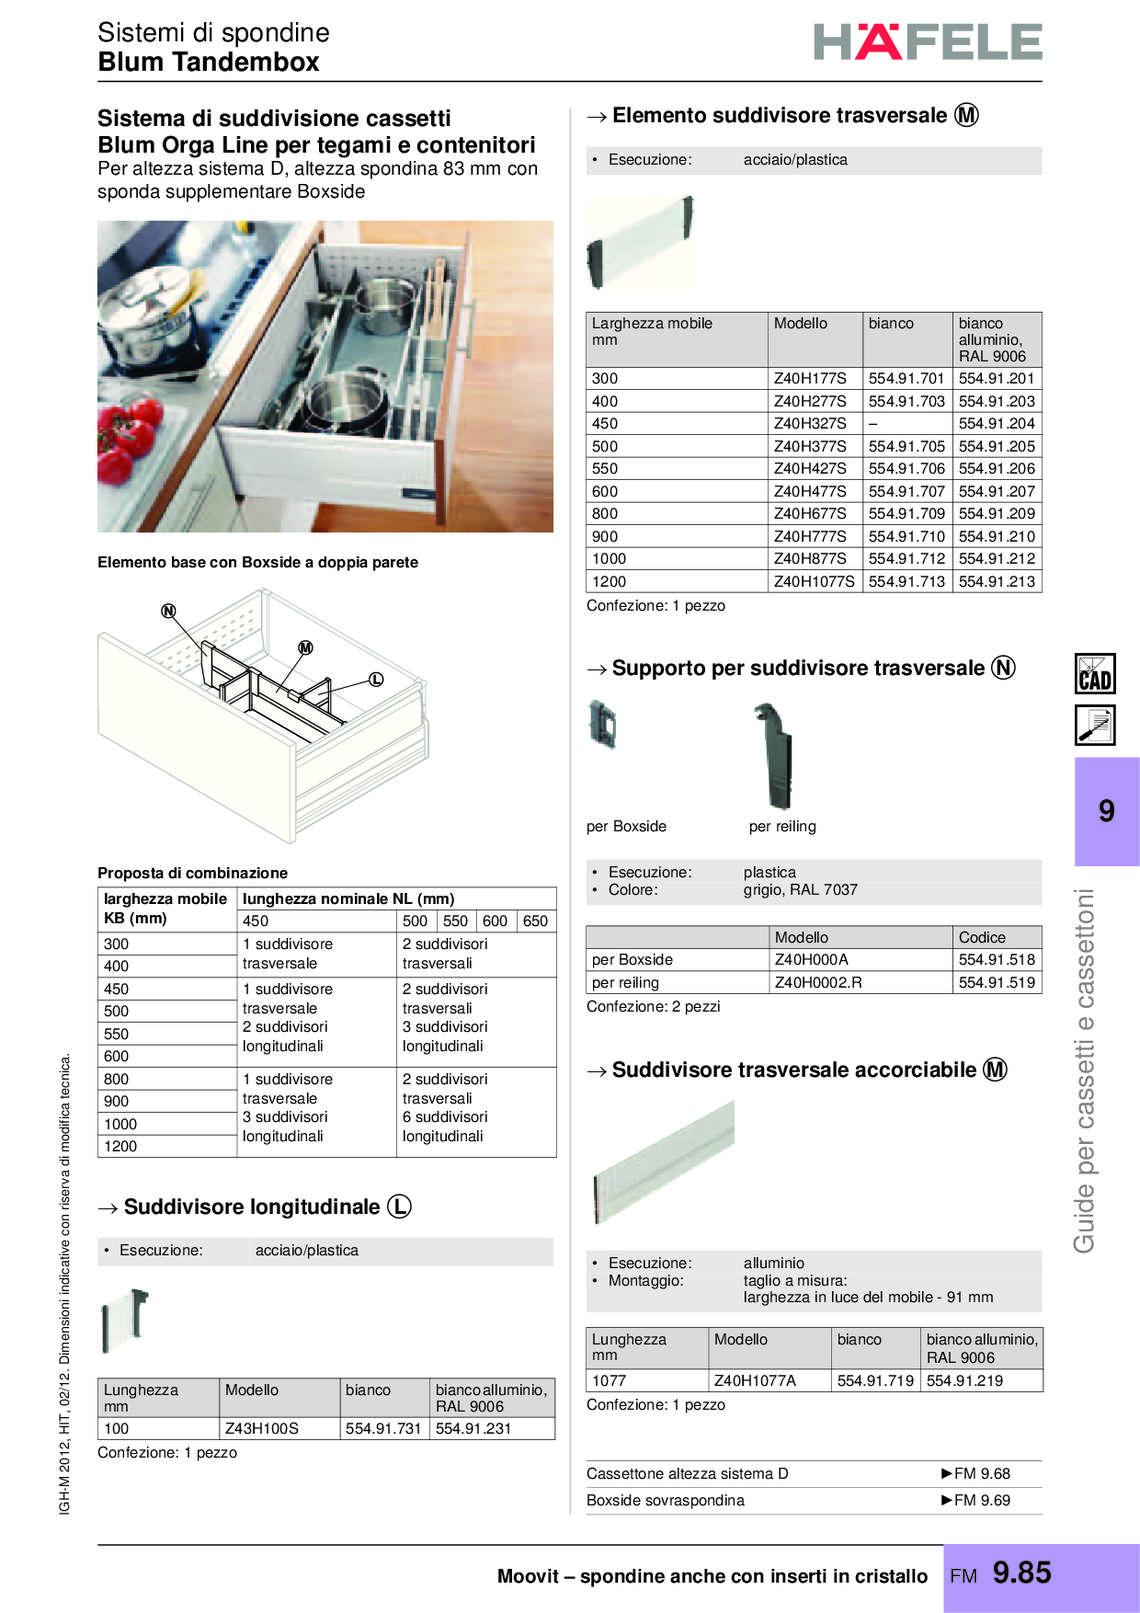 hafele-spondine-e-guide-per-mobili_40_108.jpg